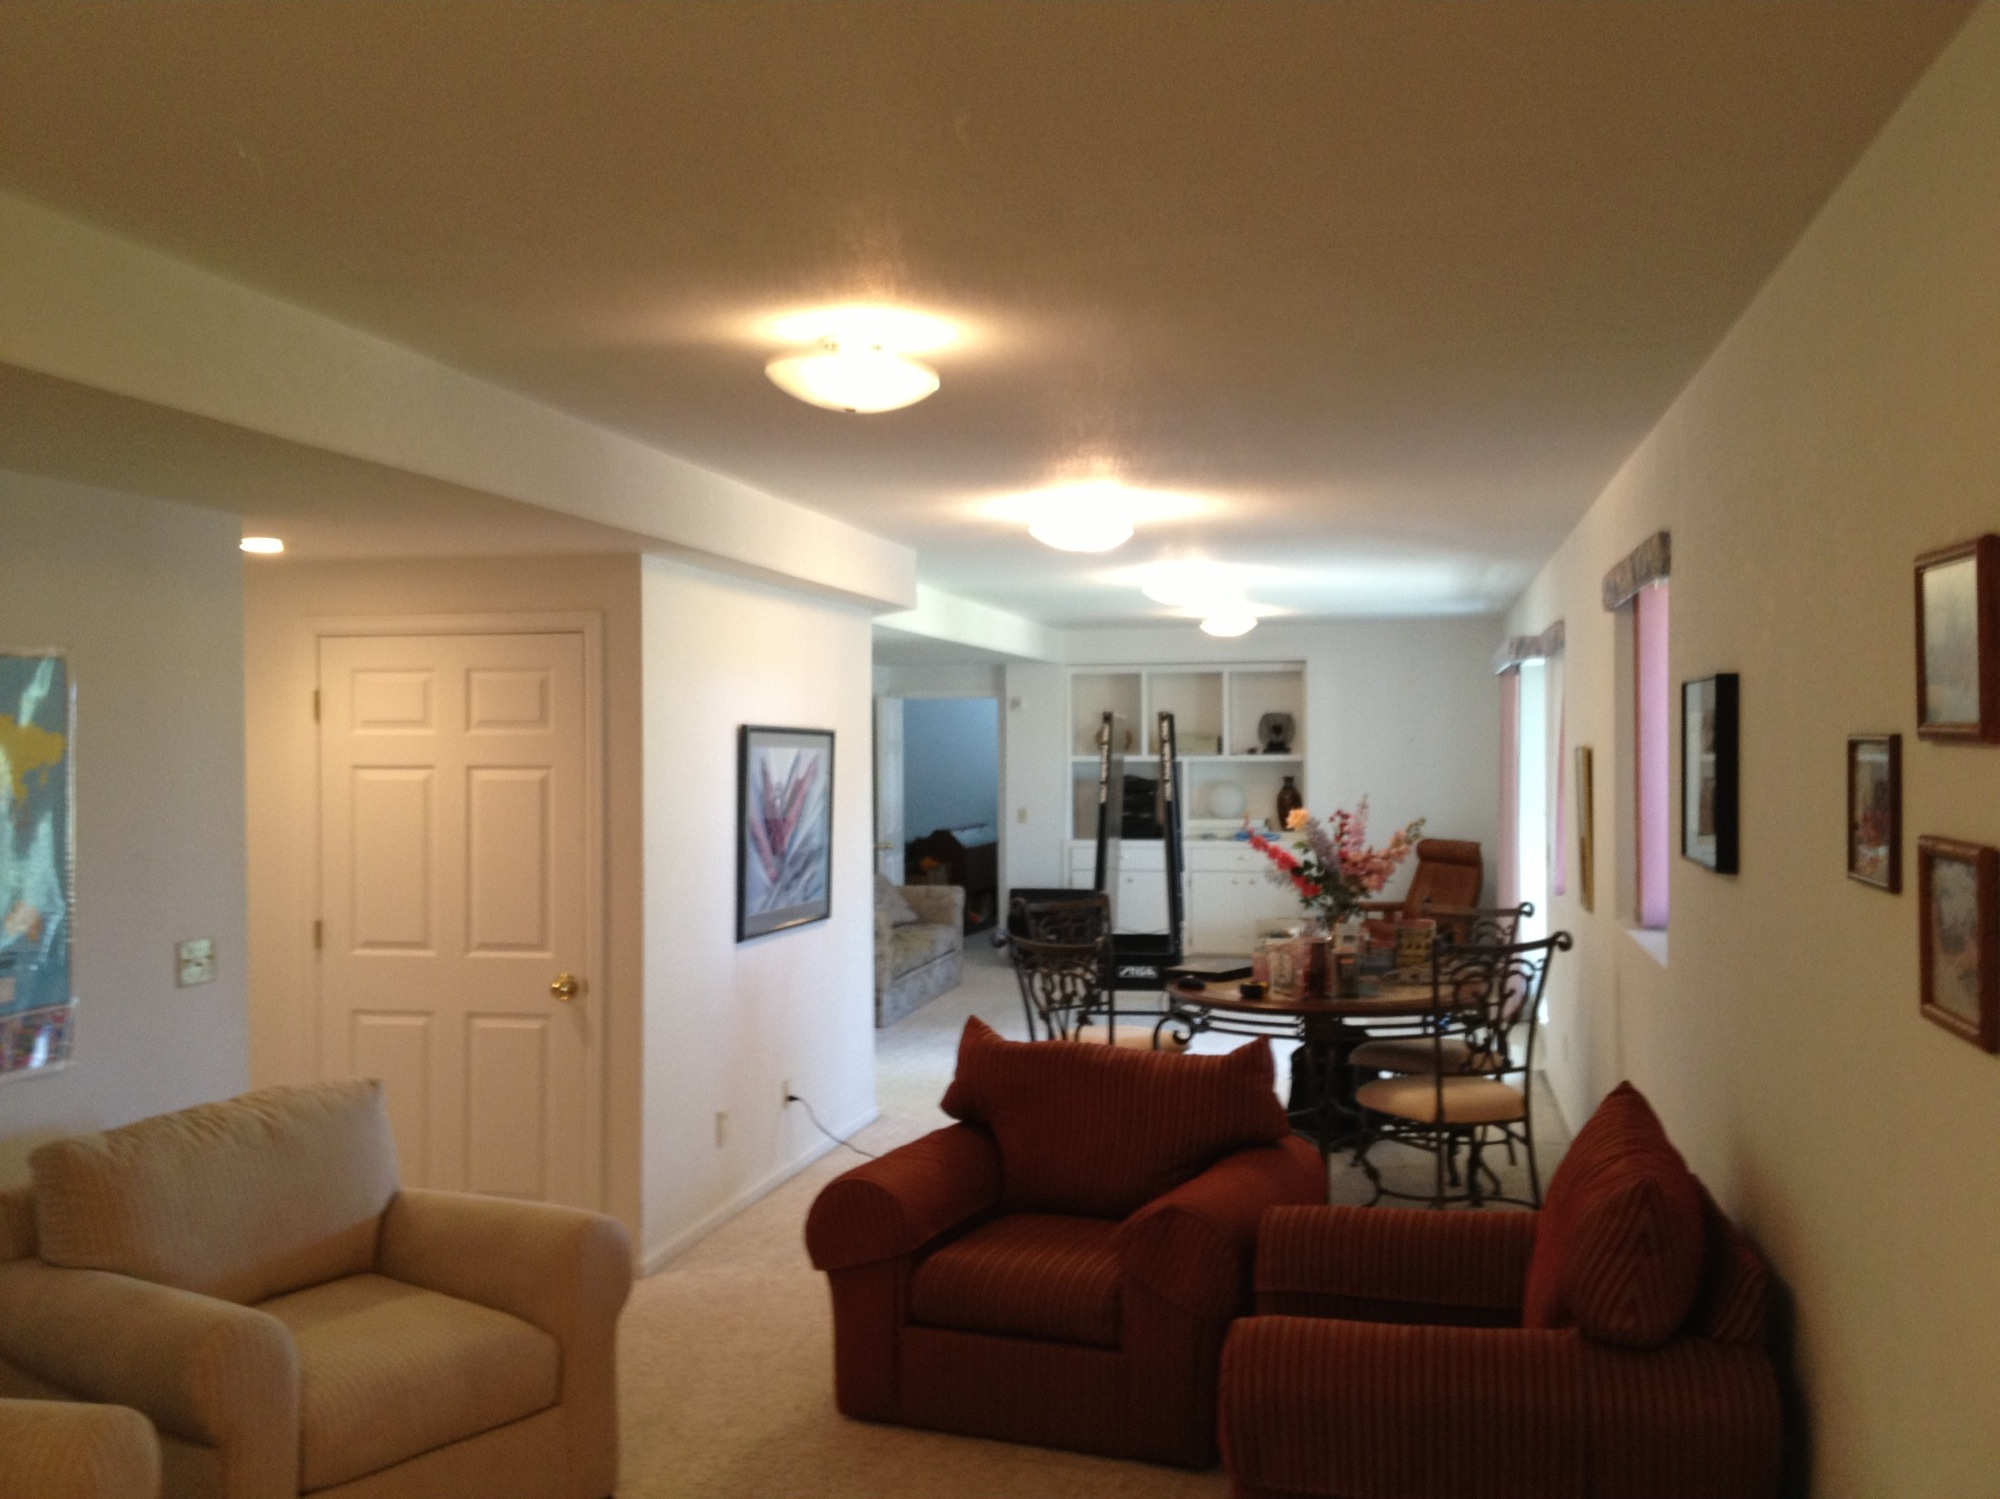 Design gallery - Designer basements ...